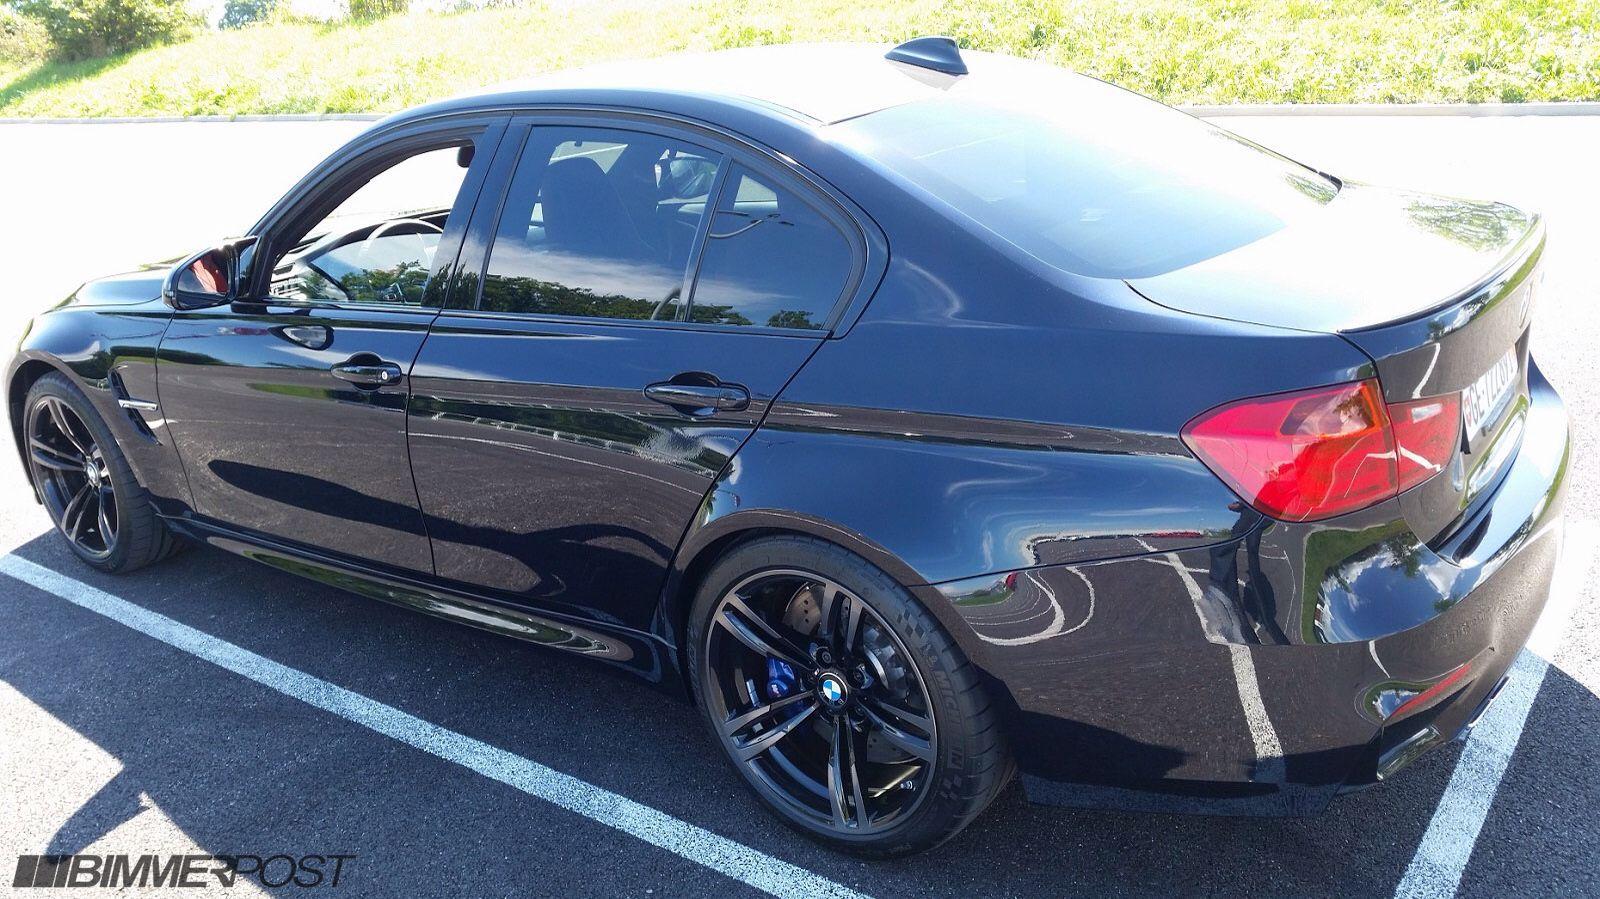 M3 azurite black  Cars  Pinterest  BMW M3 BMW and Cars